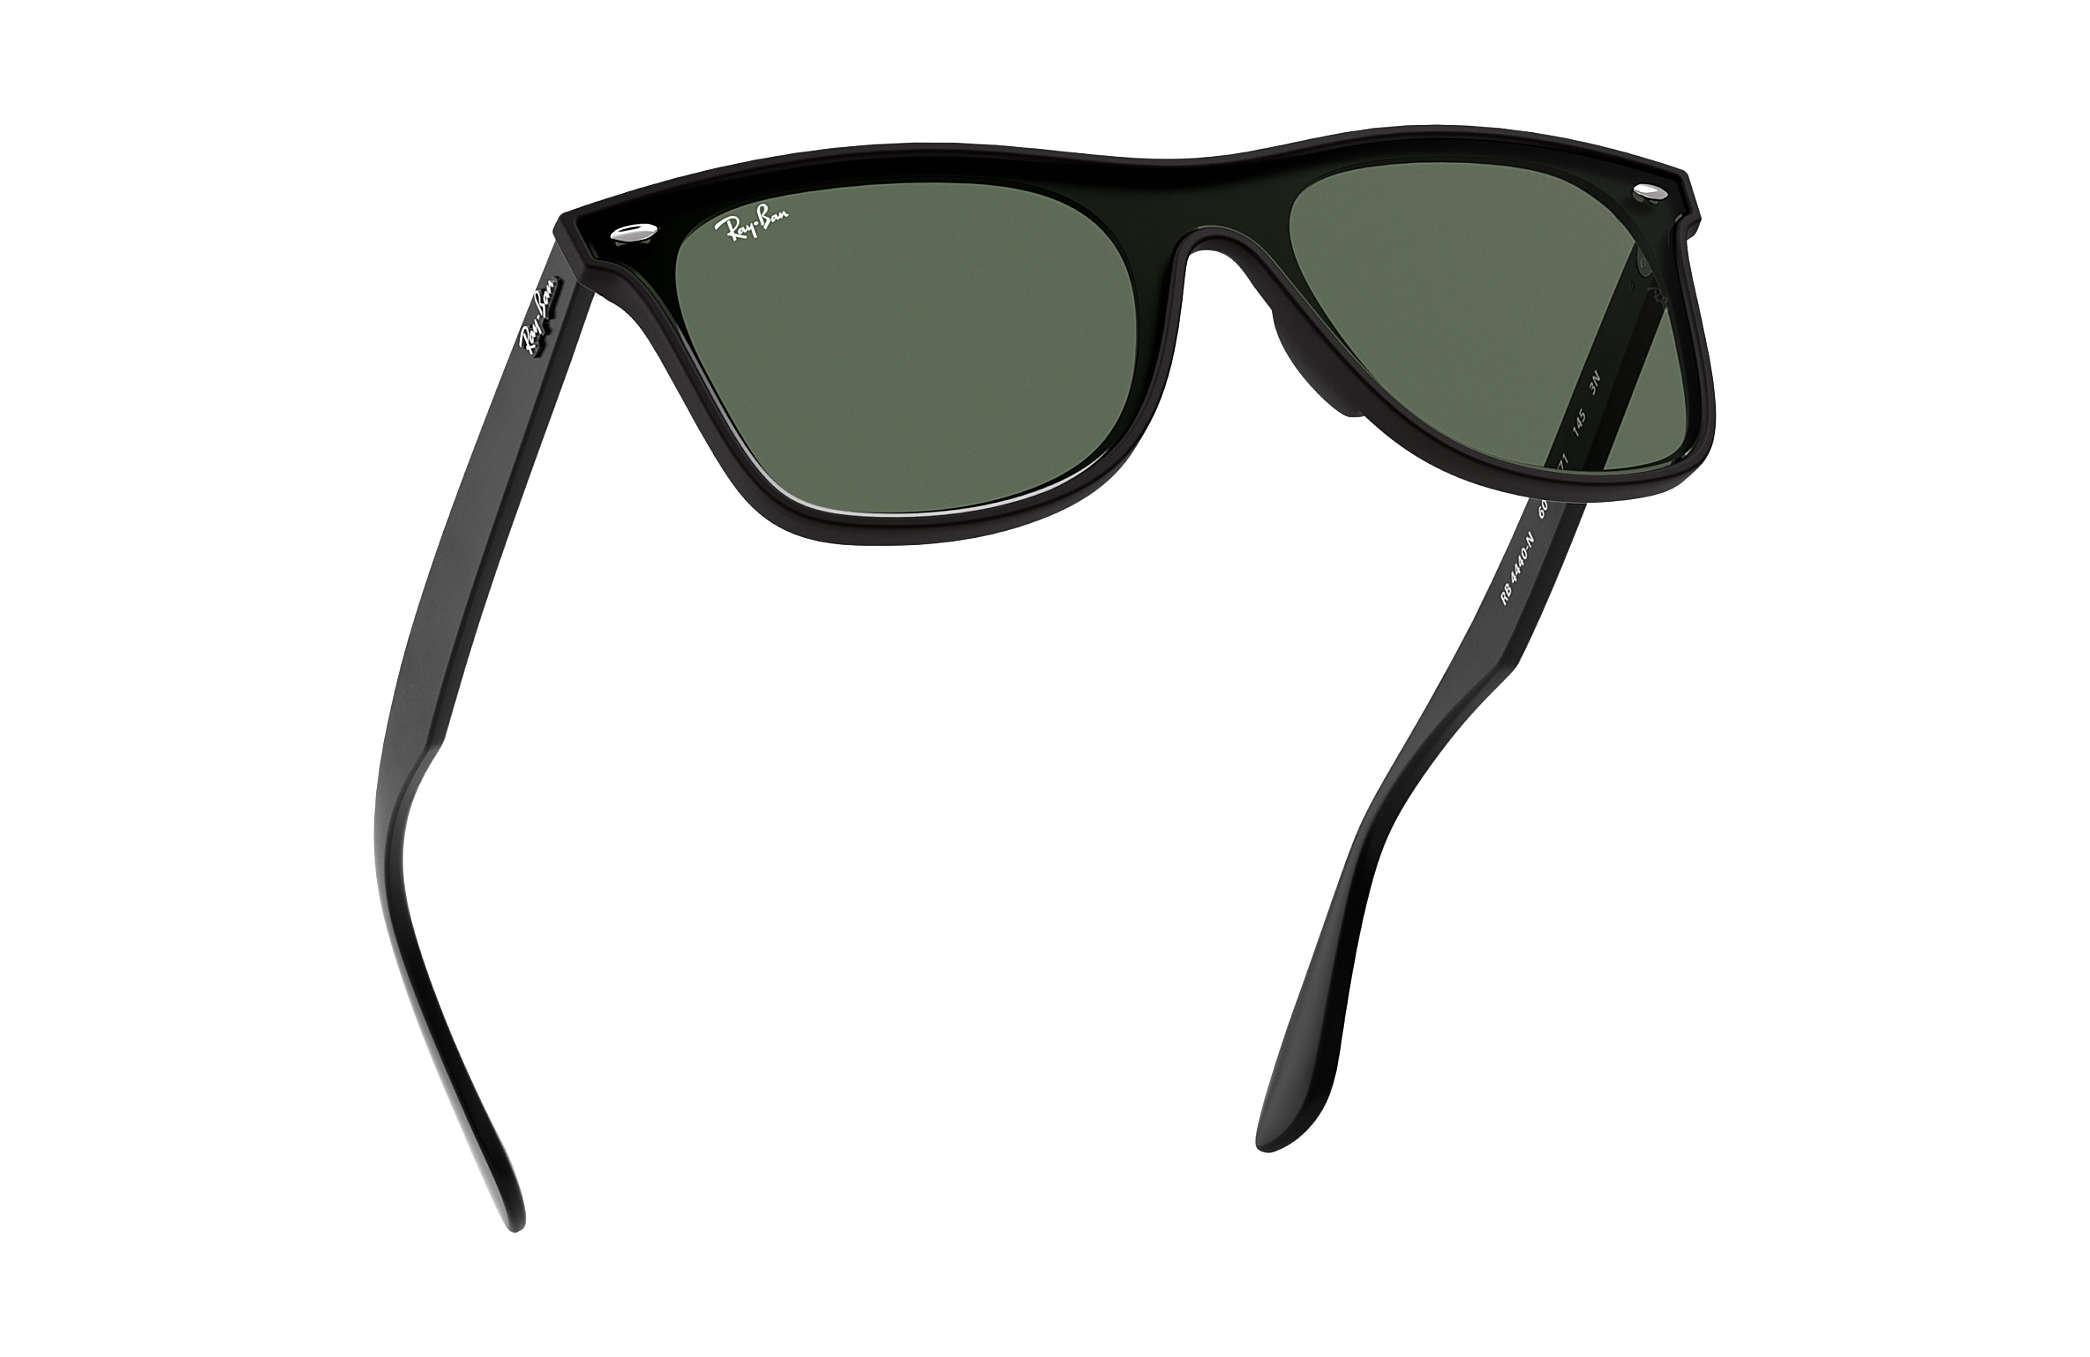 762206696b6 Ray-Ban Blaze Wayfarer RB4440N Black - Nylon - Green Lenses ...